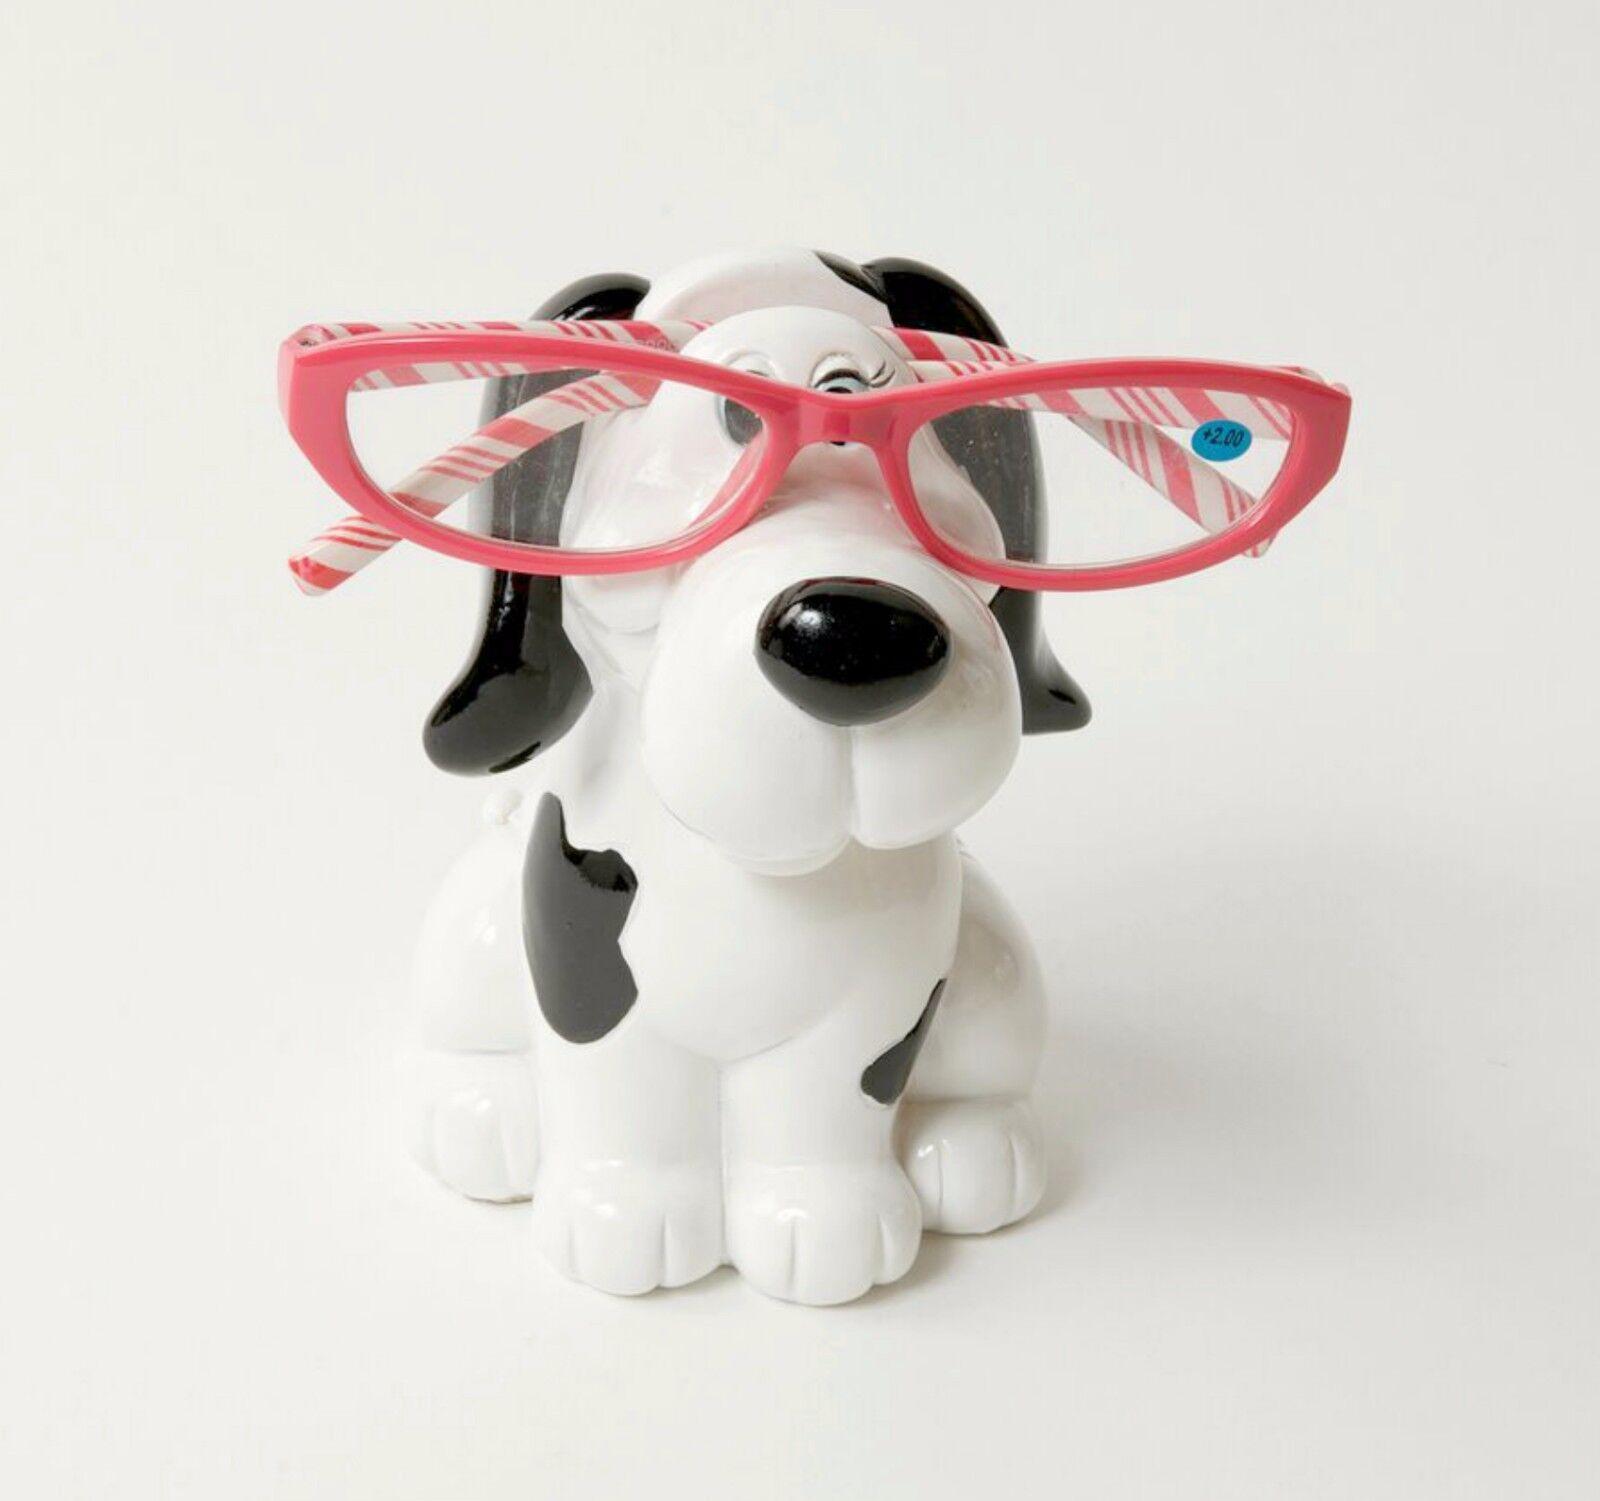 BIANCO & NERO/Cane/Occhiali da vista/Piggybank/Occhio Vetro/occhiali/Montature/